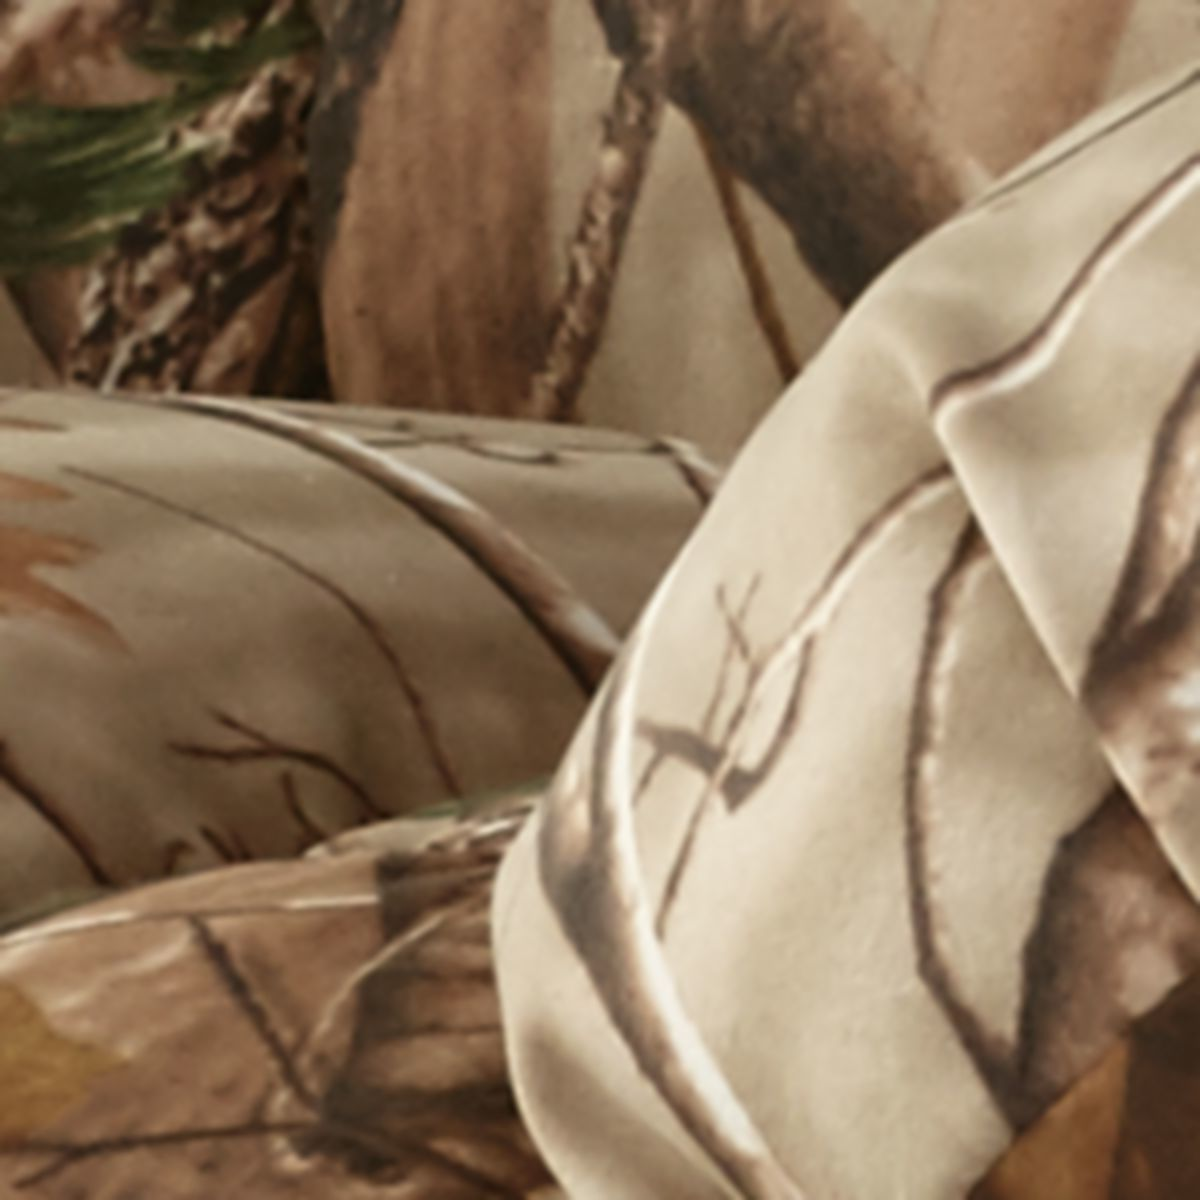 Best Home Furnishings Outdoorsman Max Recliner with Heat/Massage Rocker/Recliner